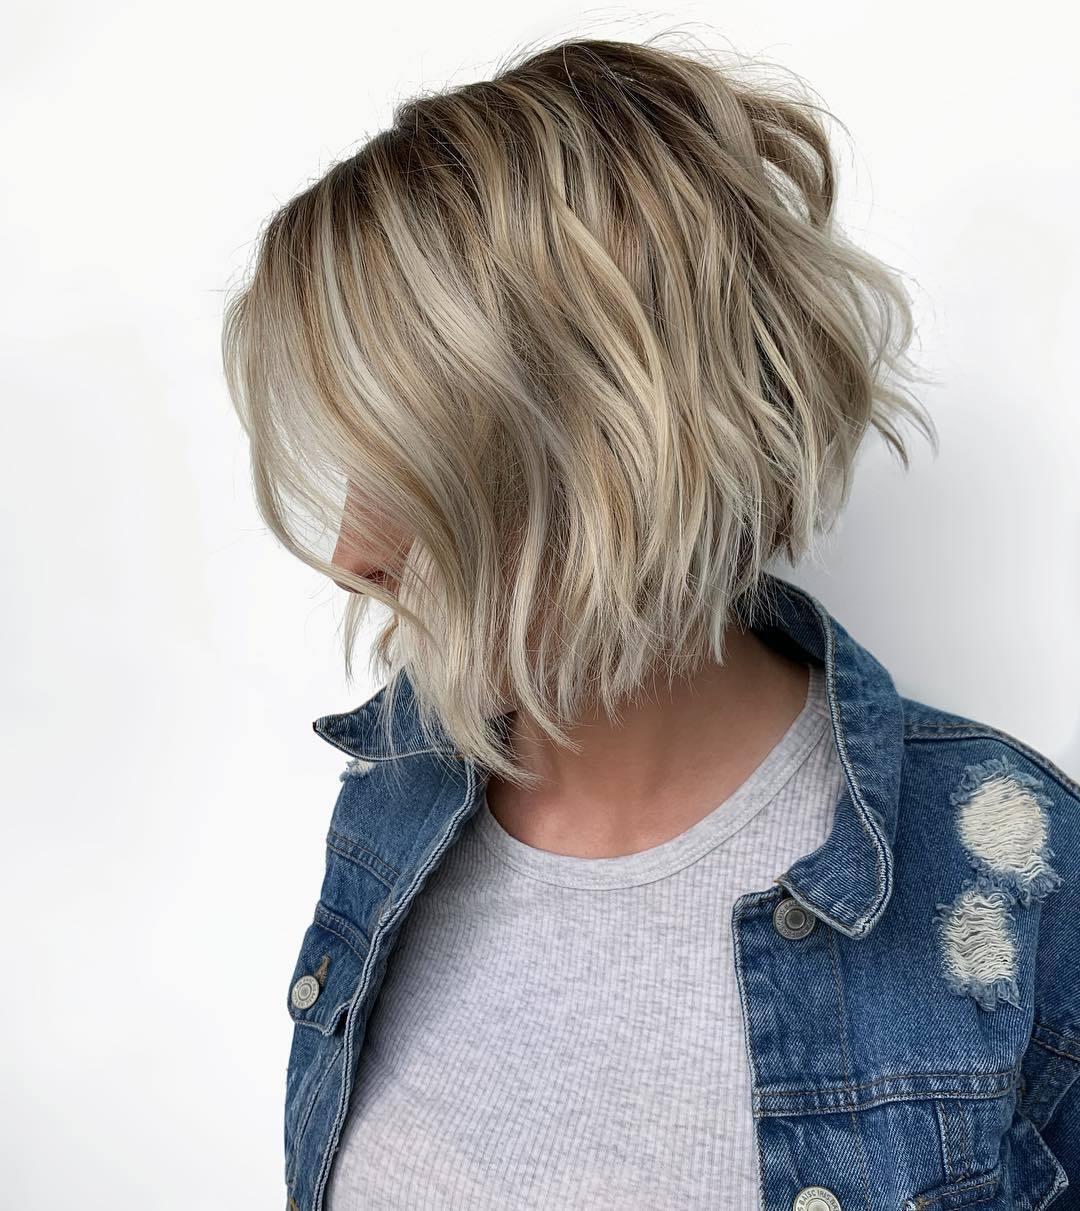 Woman with ash blonde wavy graduated bob, wearing grey top and denim in studio